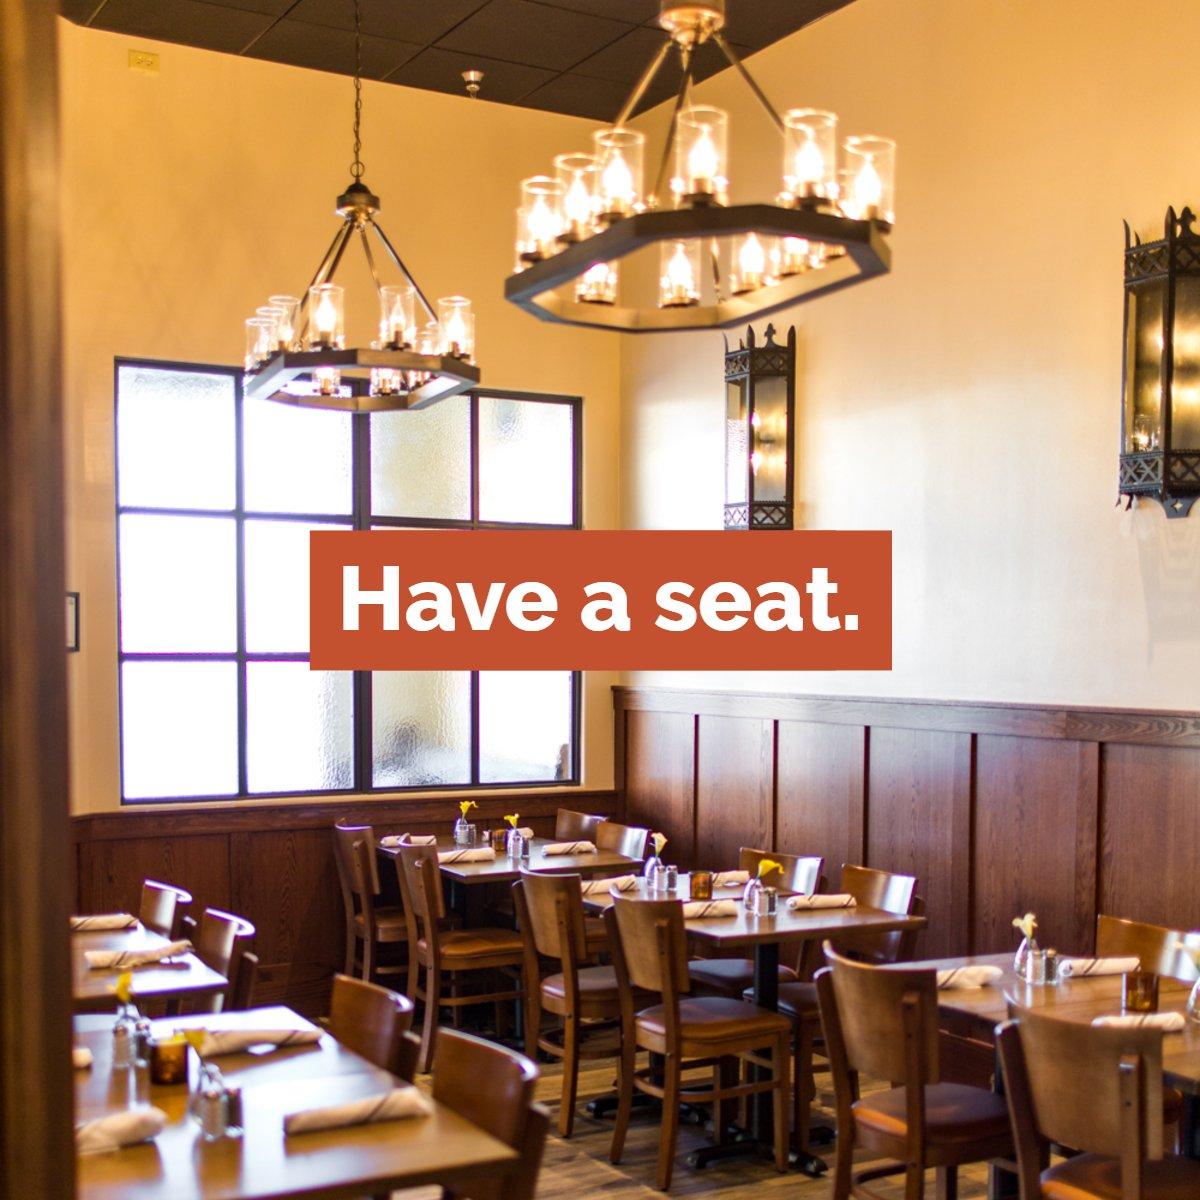 Los Arroyos Restaurant & Baropened December 2016 - Carmel, Indiana